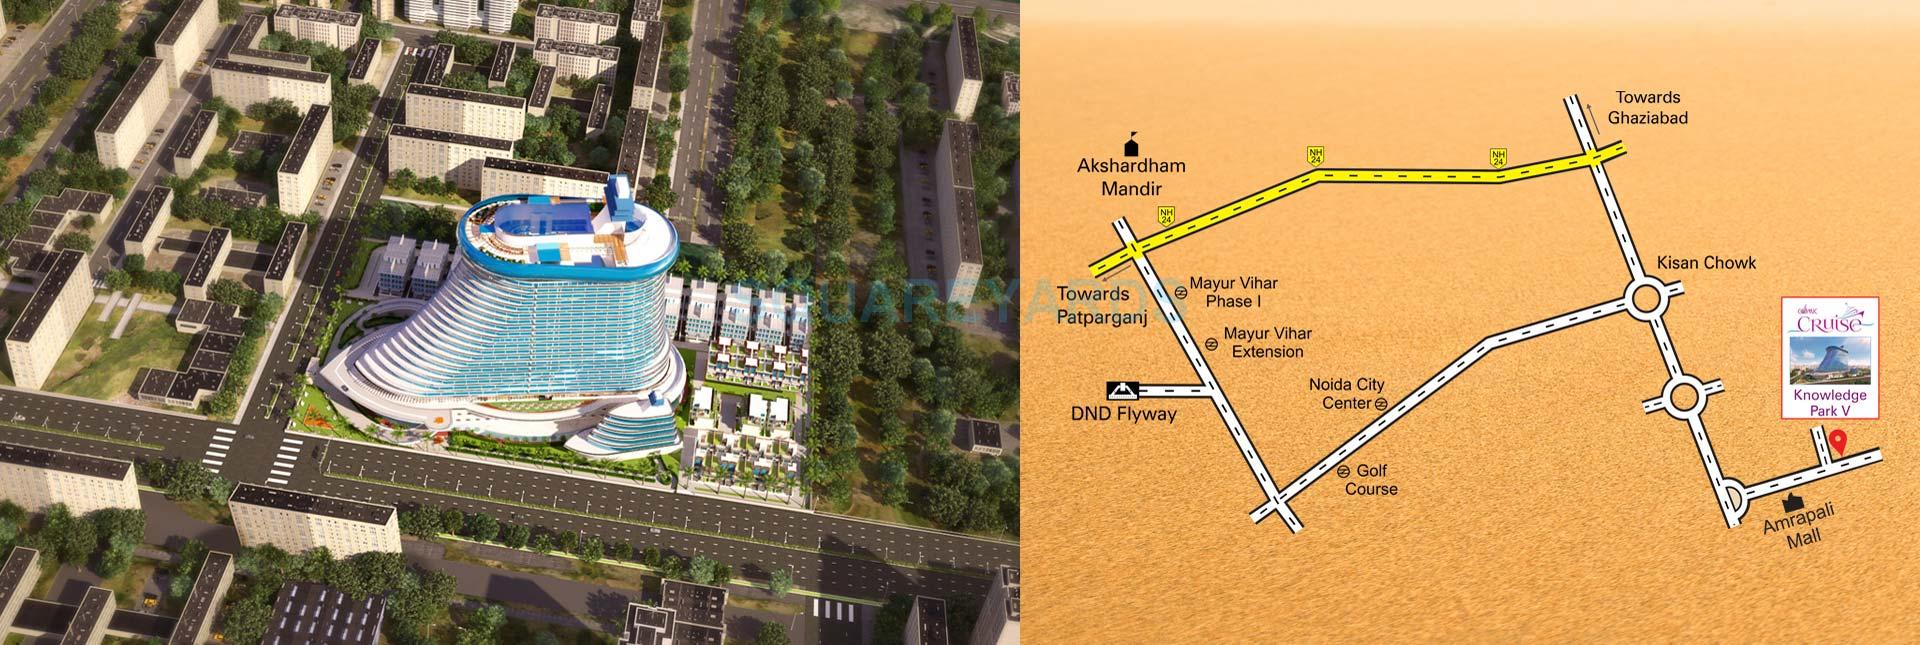 cosmic cruise villas location image1